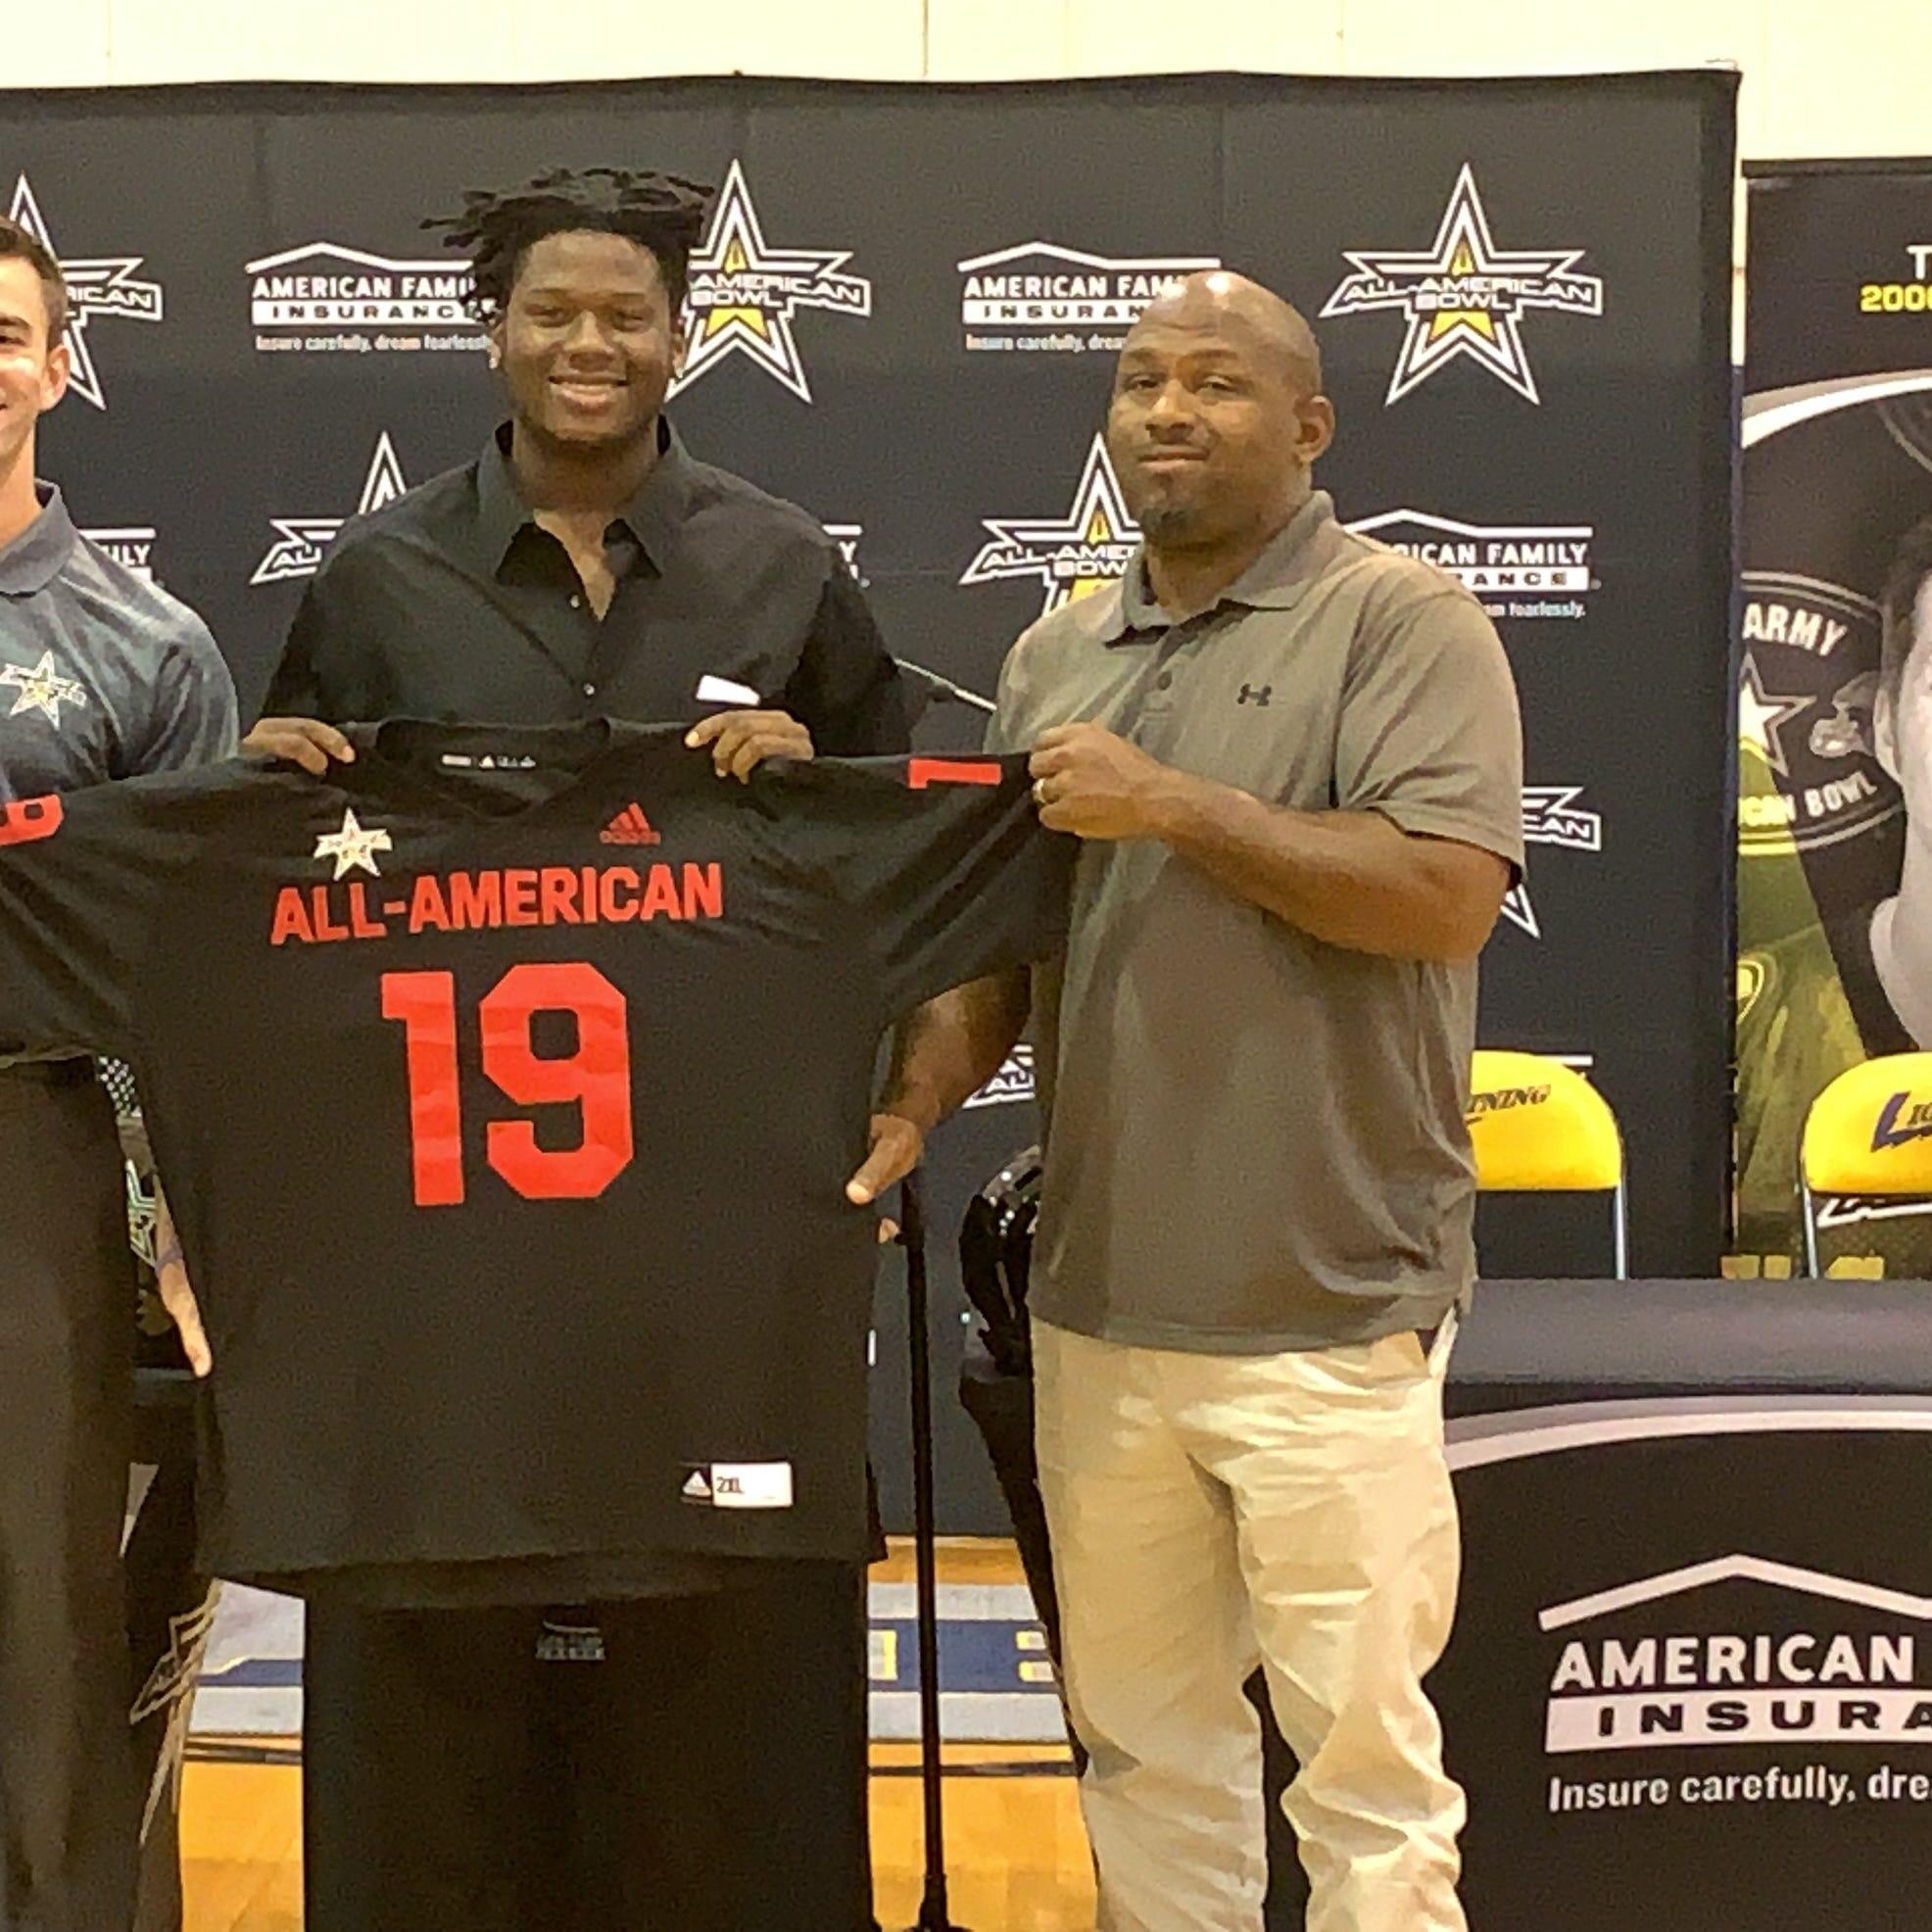 Florida State commit, Lehigh 4-star DE Quashon Fuller receives All-American Bowl jersey